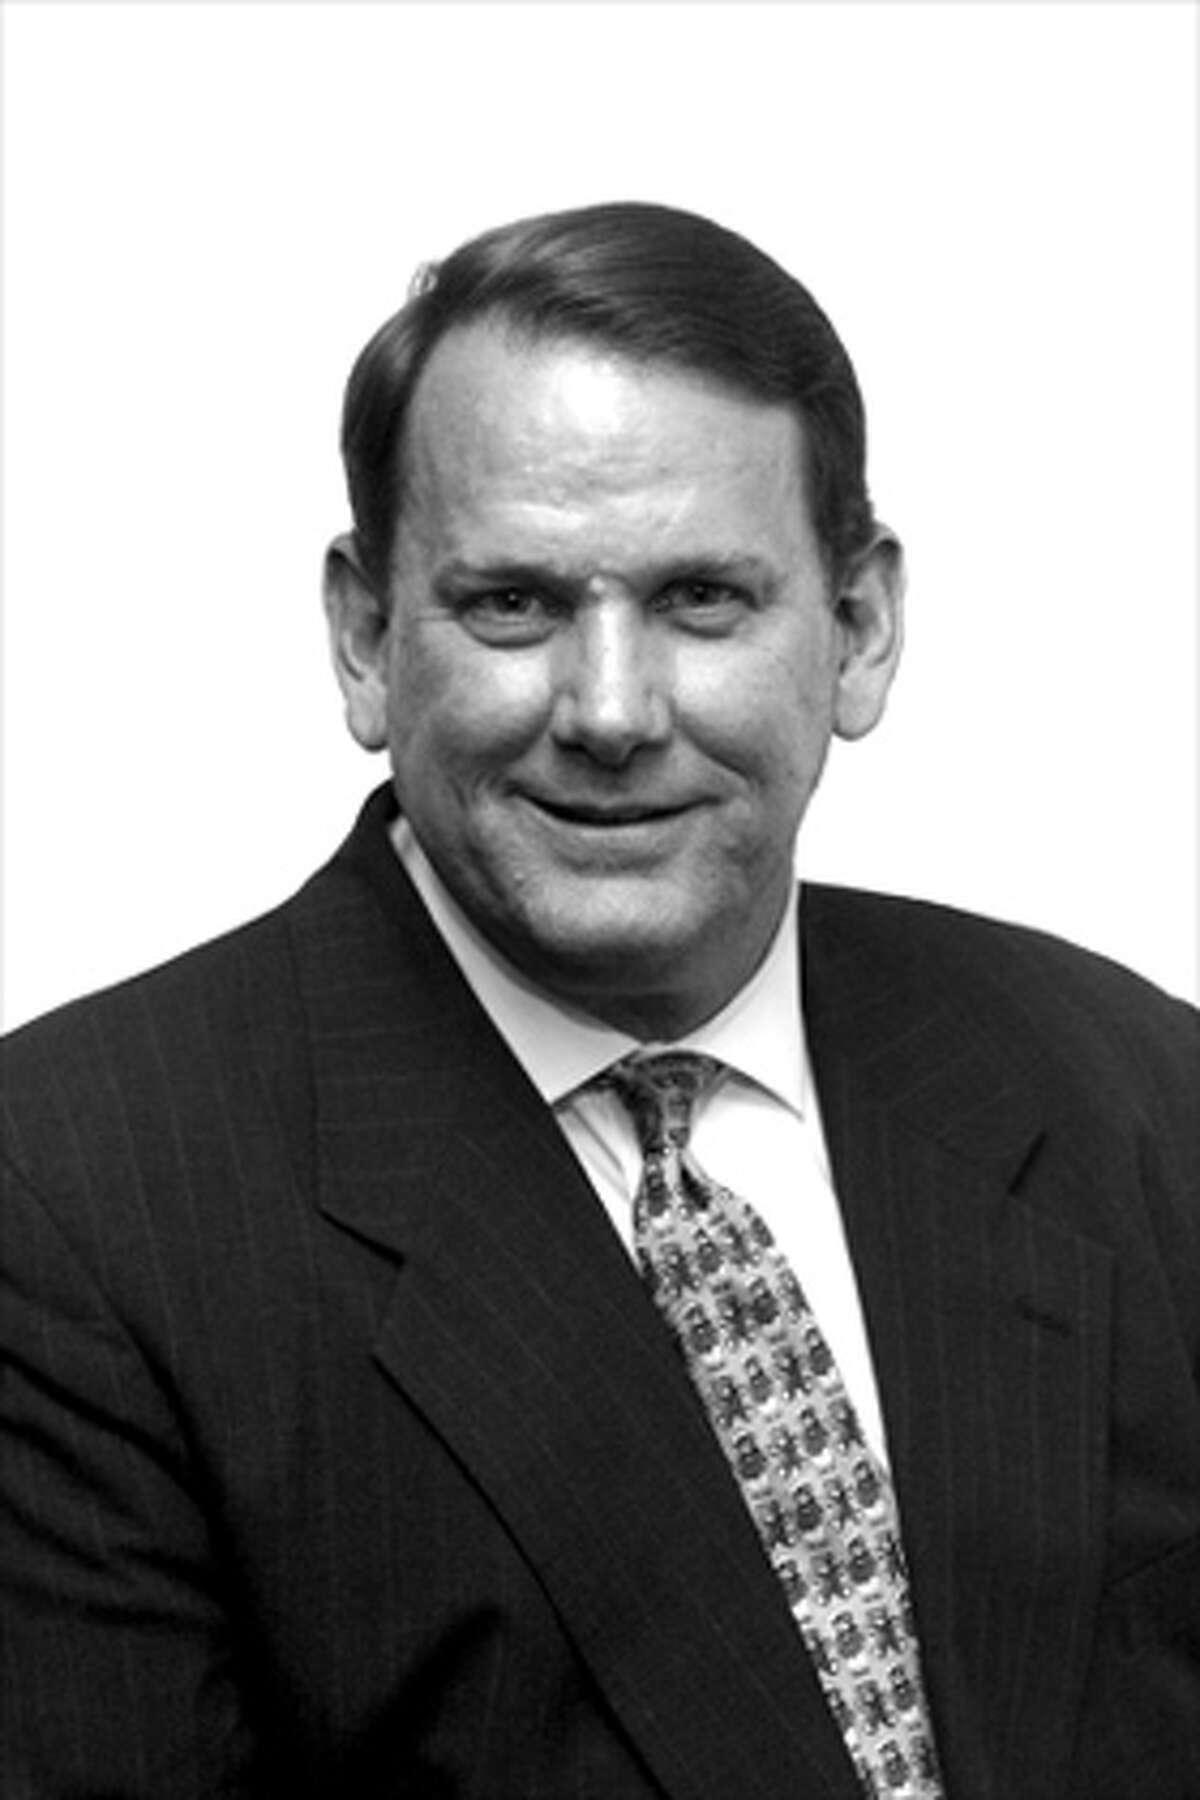 Sam Stovall, Chief Equity Strategist, S&P Capital IQ